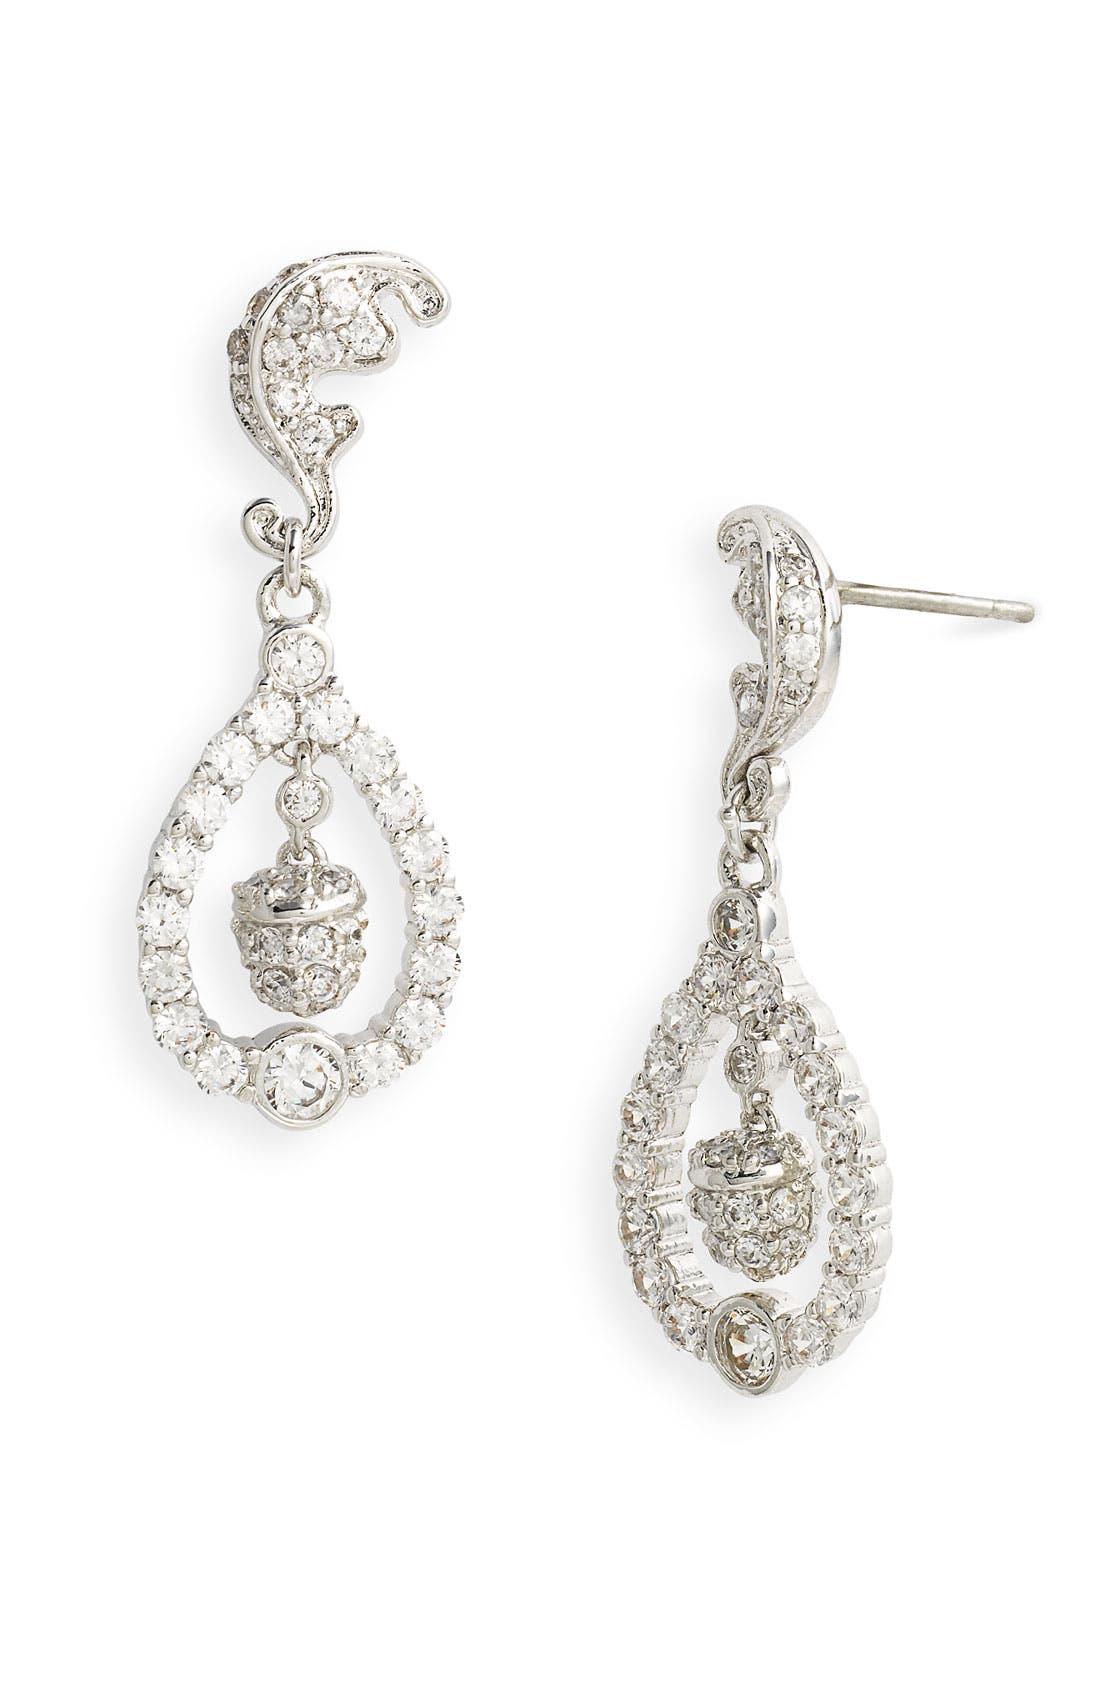 Main Image - Ariella Collection Acorn & Leaf Earrings